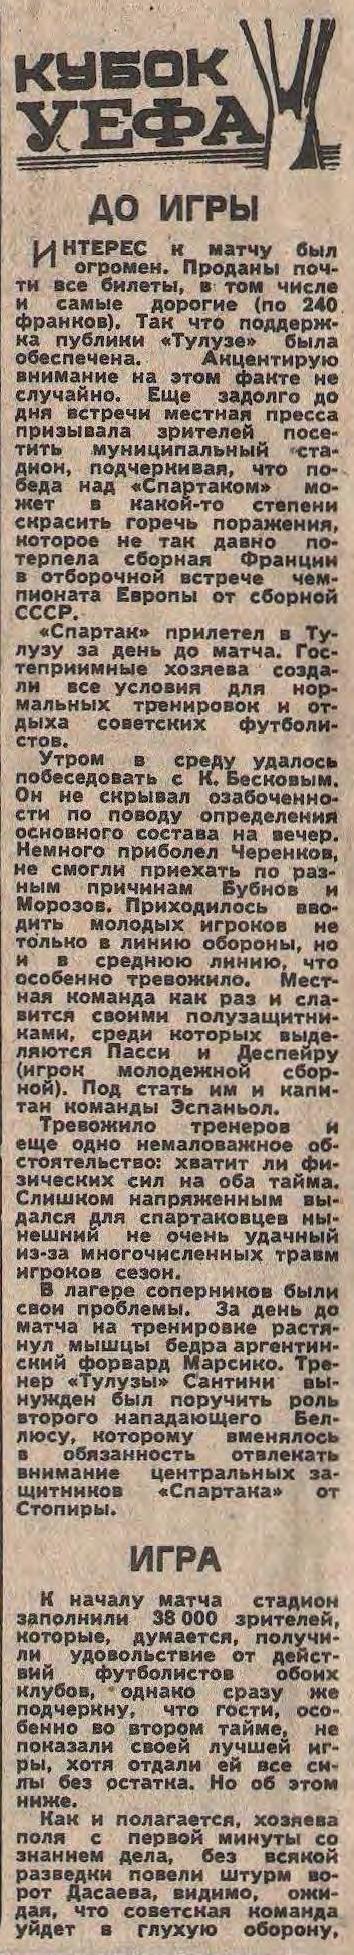 Тулуза (Франция) - Спартак (СССР) 3:1